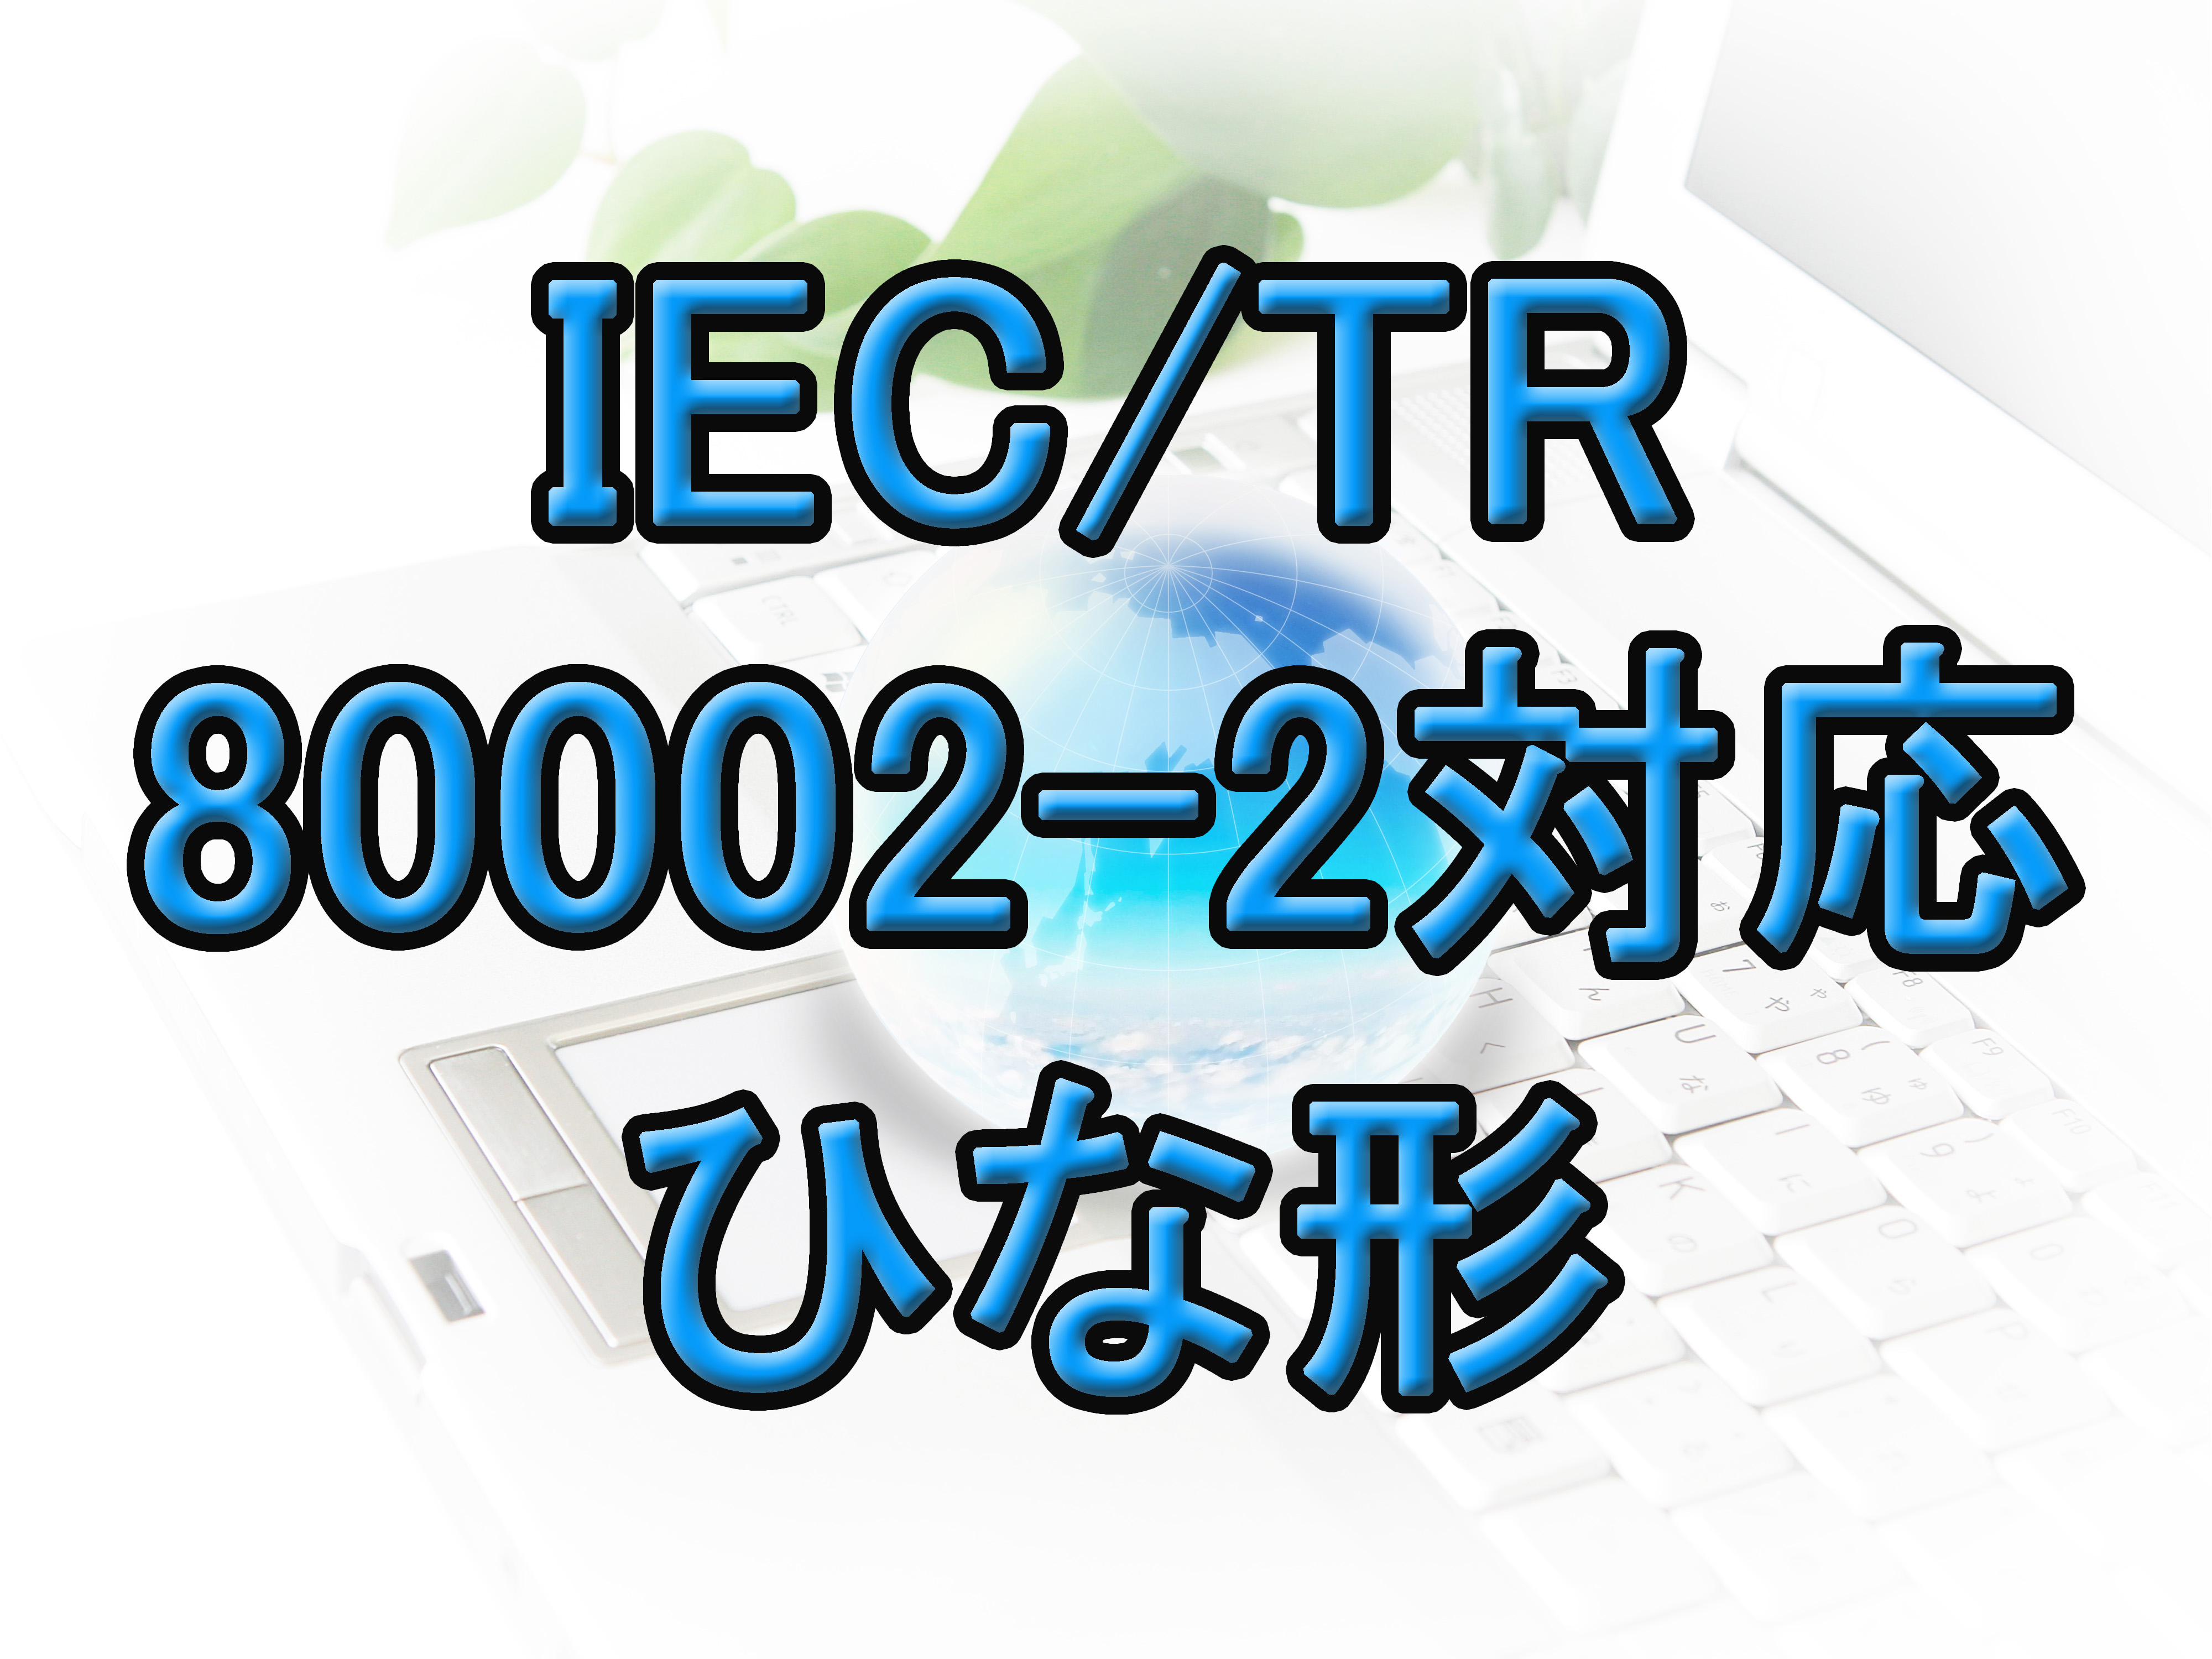 【IEC/TR 80002-2対応】 コンピュータバリデーション手順書